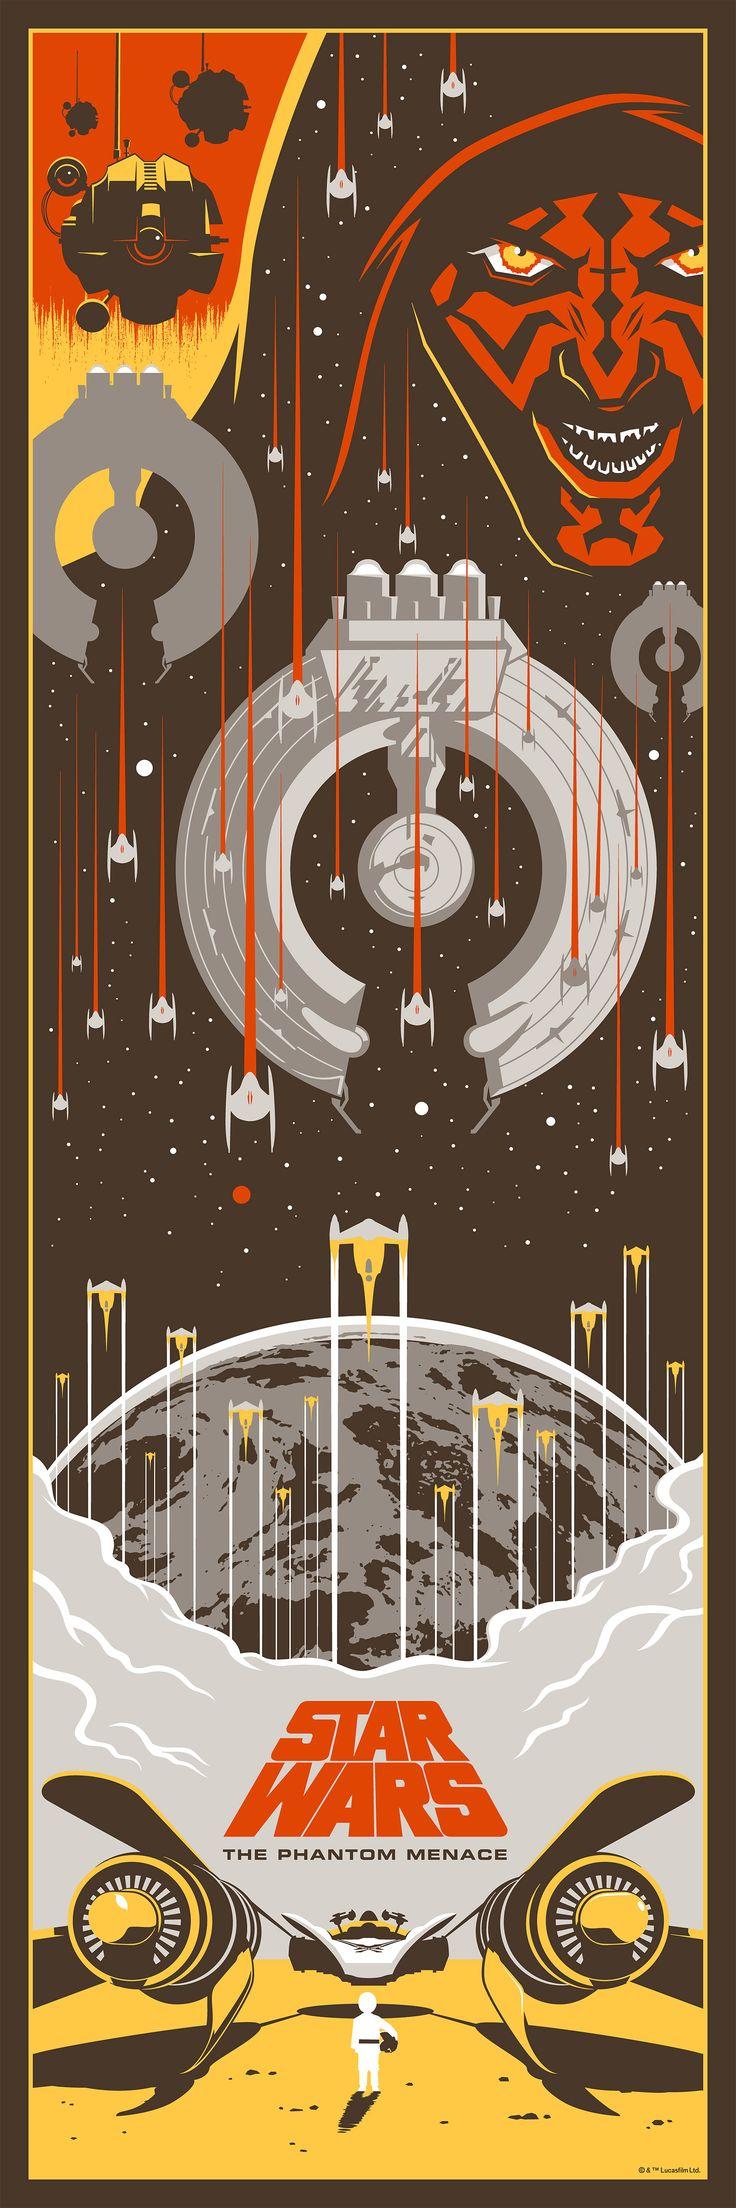 Star Wars I: The Phantom Menace, by Eric Tan #erictan #starwarsprint